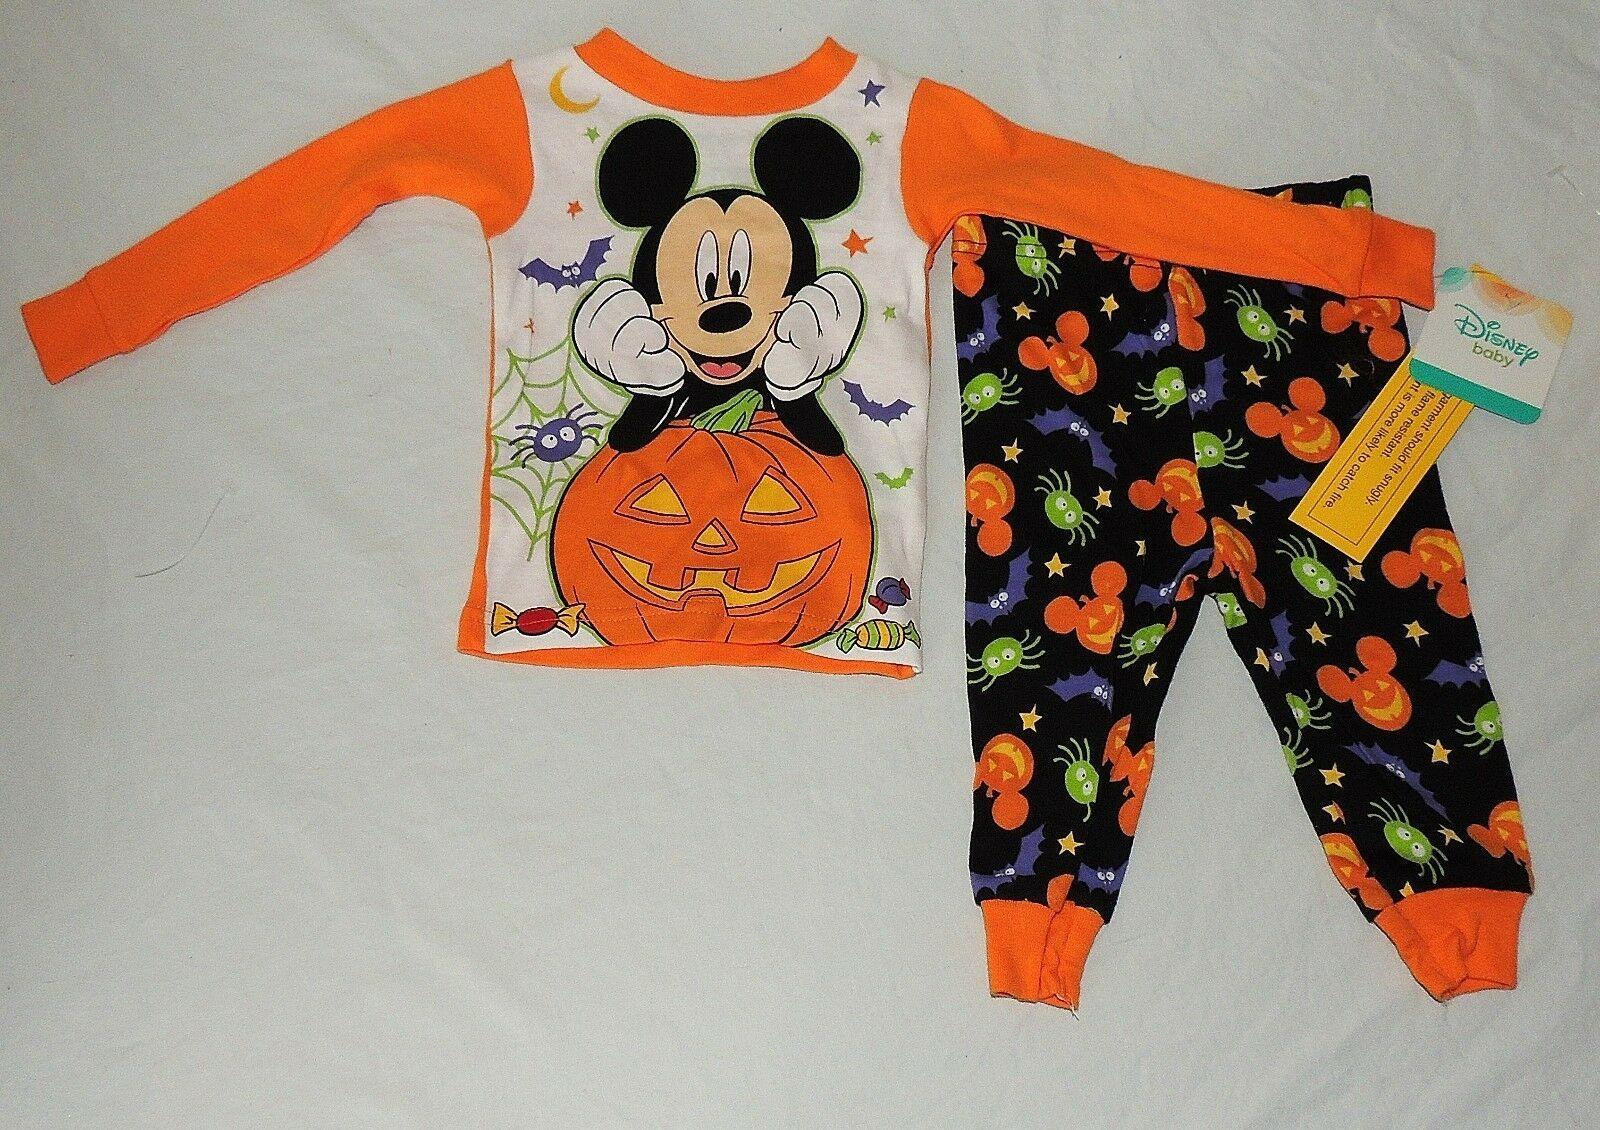 Children's Unisex Clothing New Toddler Disney Lion Guard King Pajamas Size 2 Short Sleeve Pants Kion Other